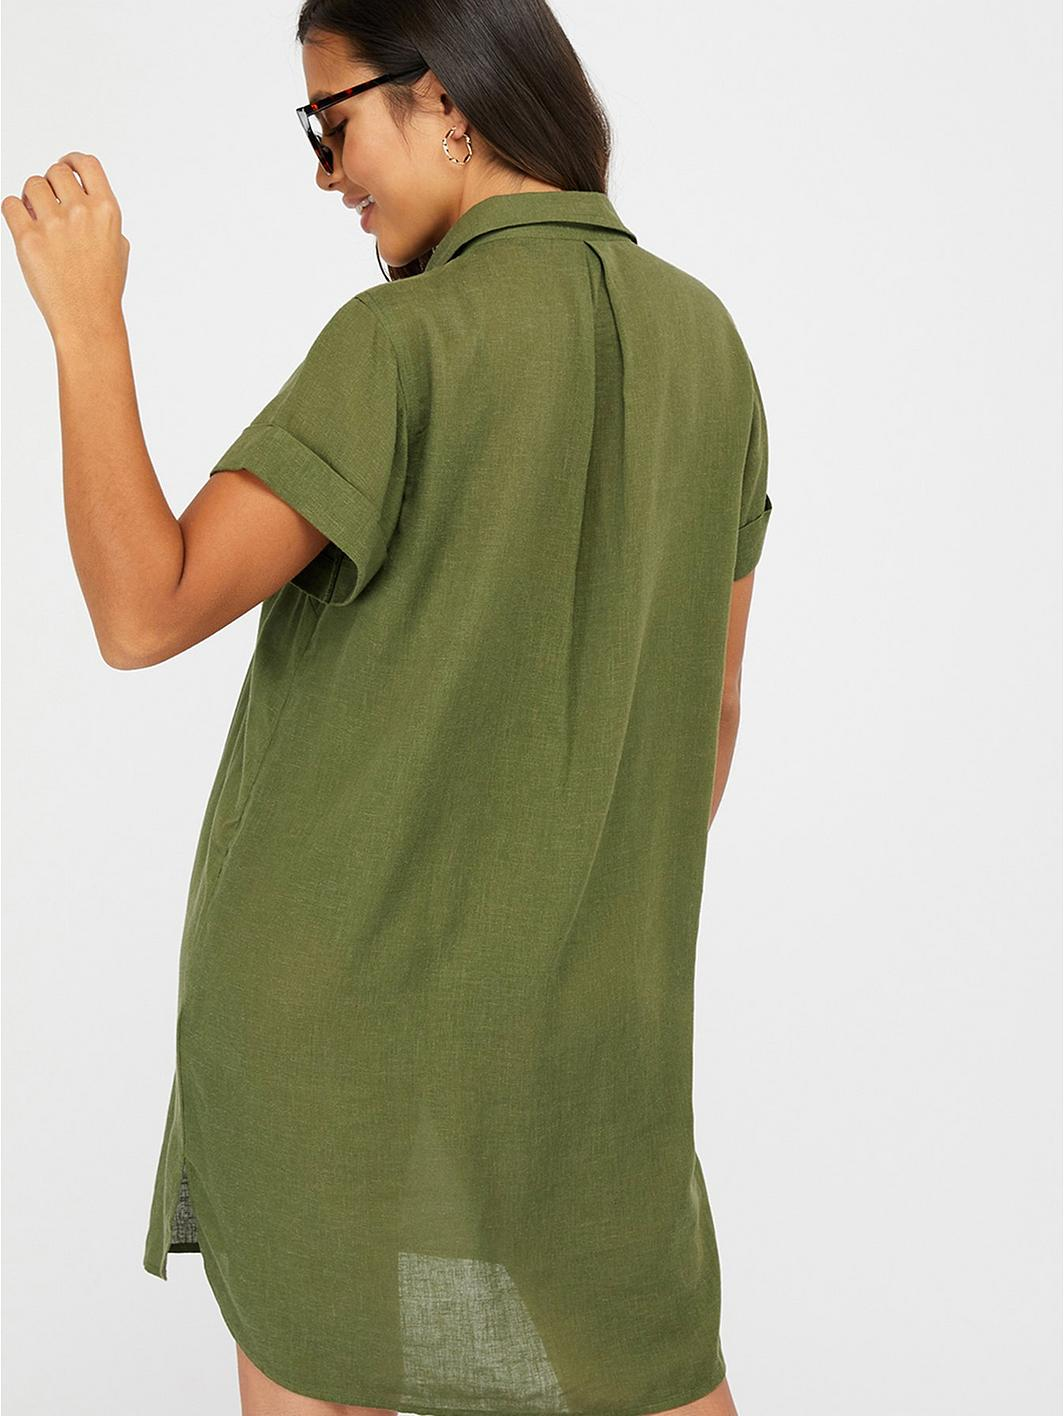 Accessorize Beach Shirt - Khaki VCVh0B